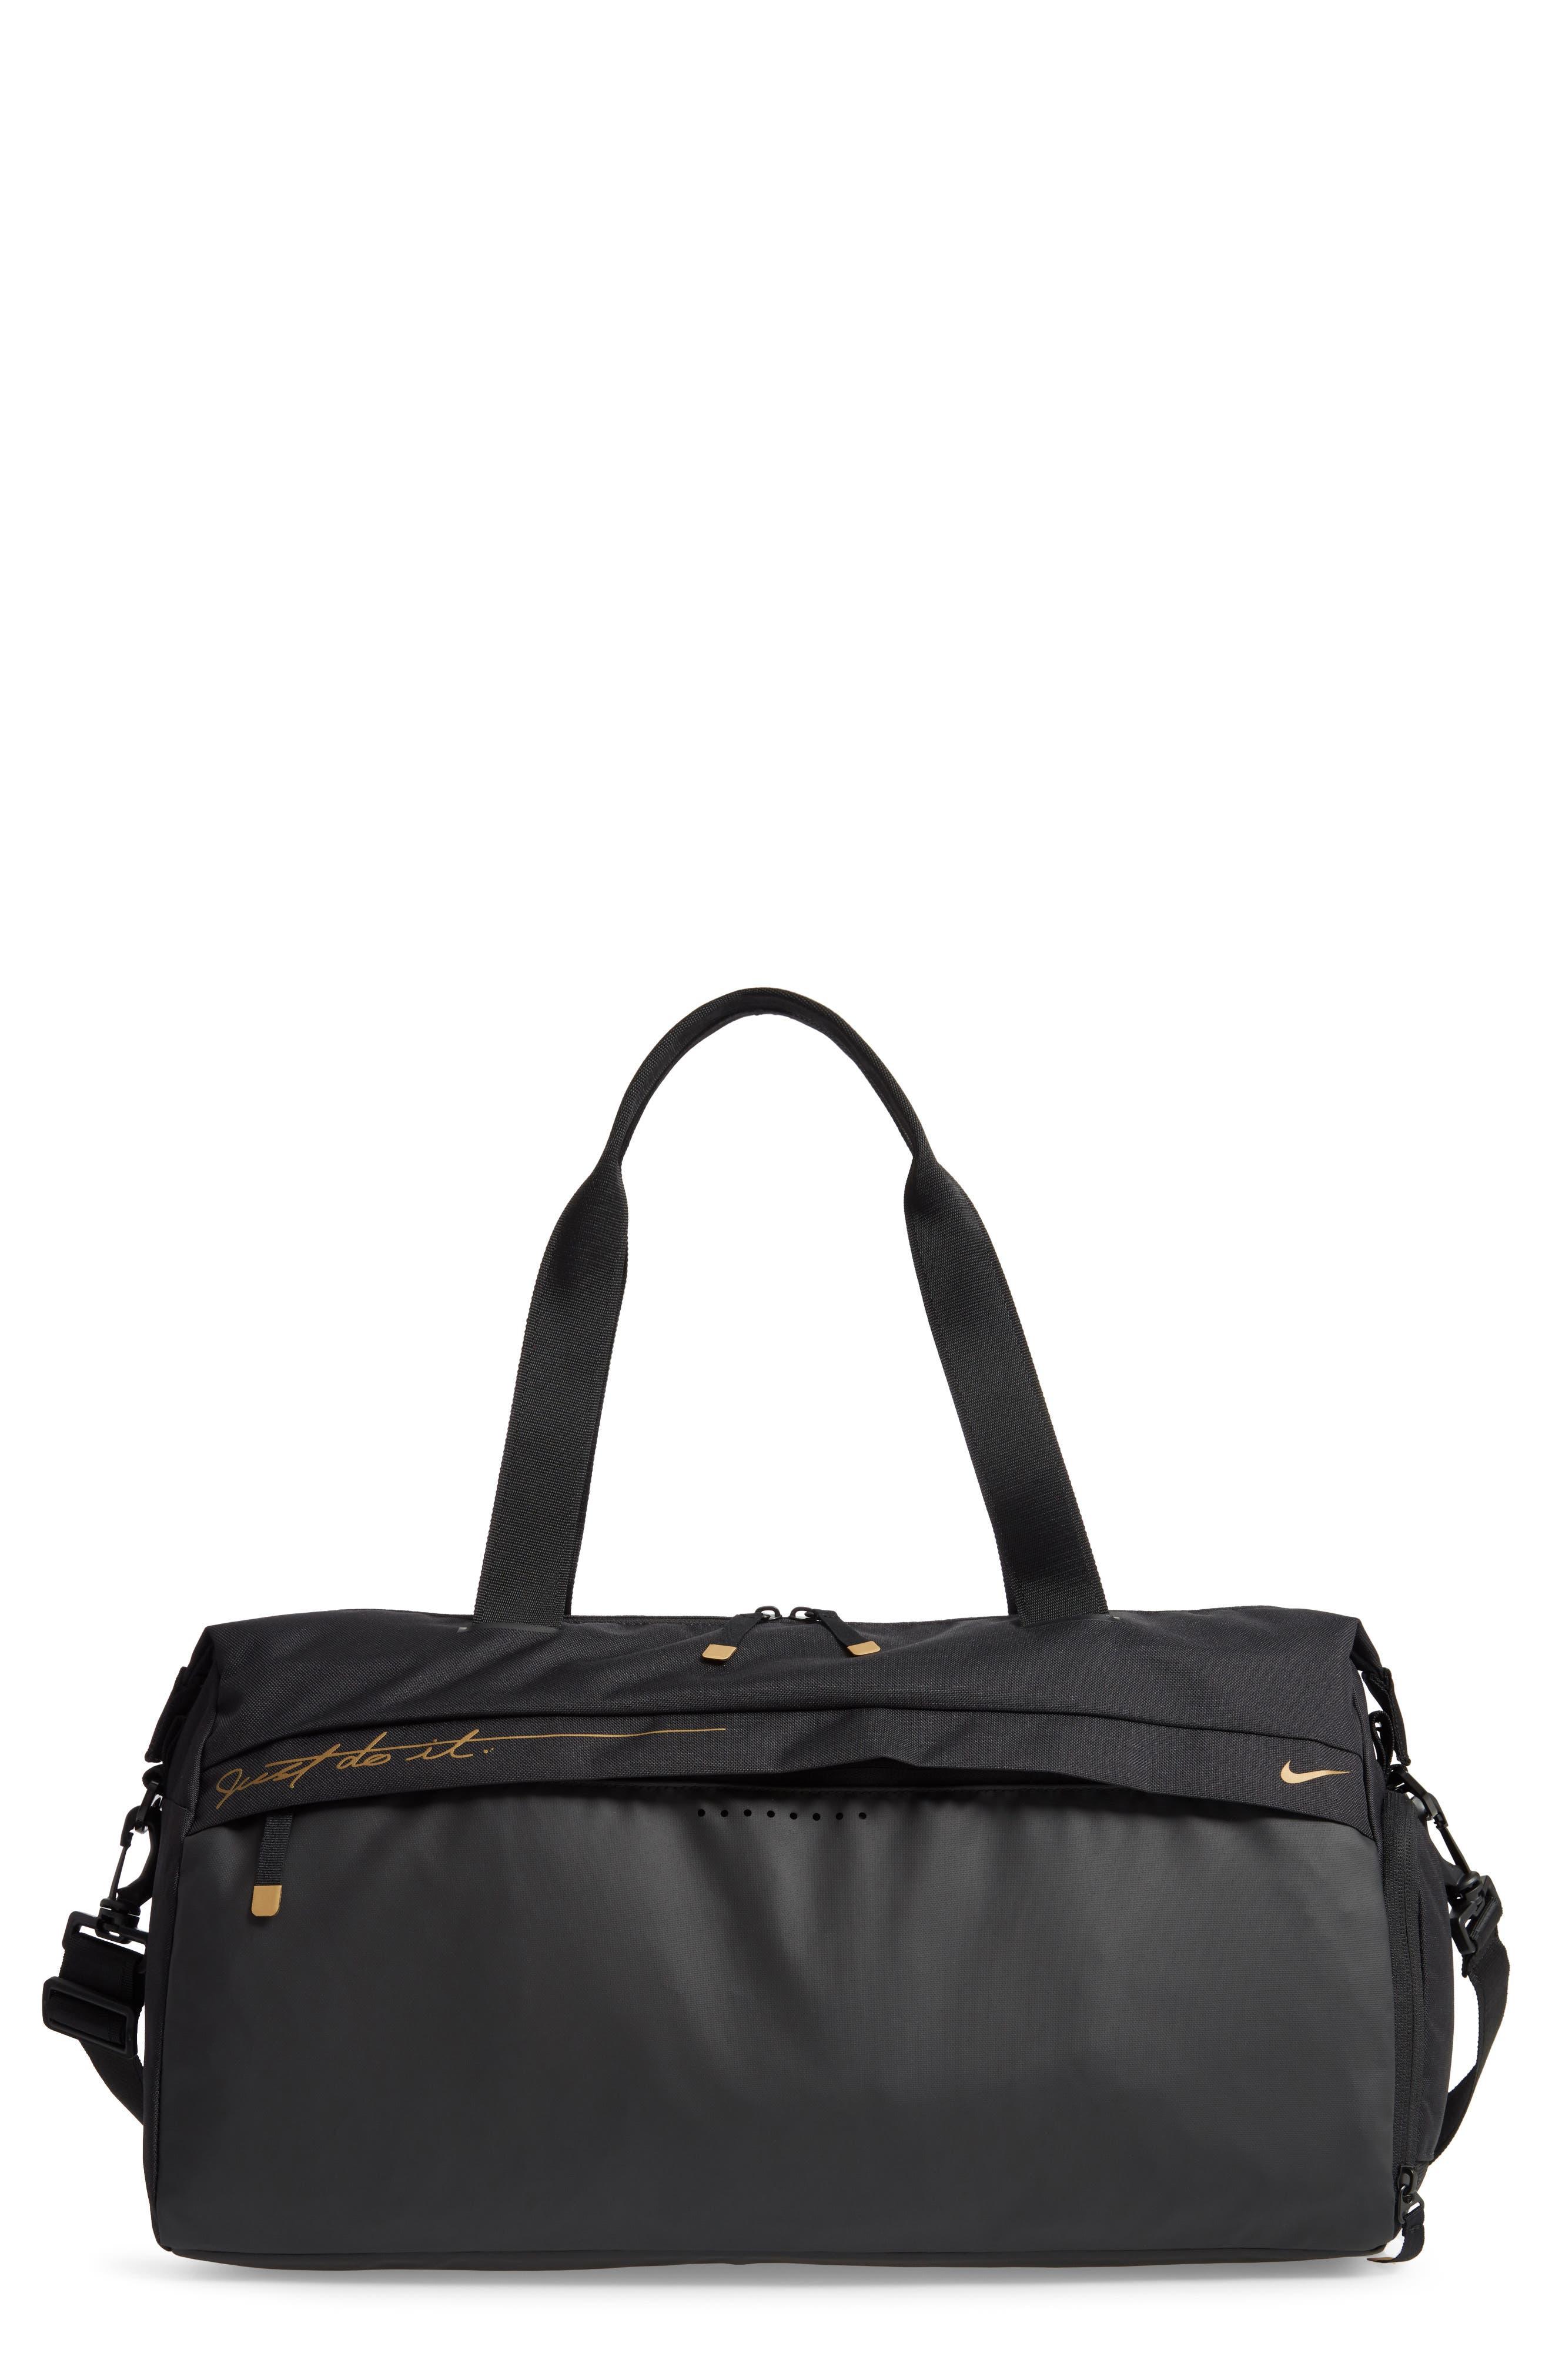 Radiate Club Training Bag,                         Main,                         color, BLACK/ BLACK/ METALLIC GOLD